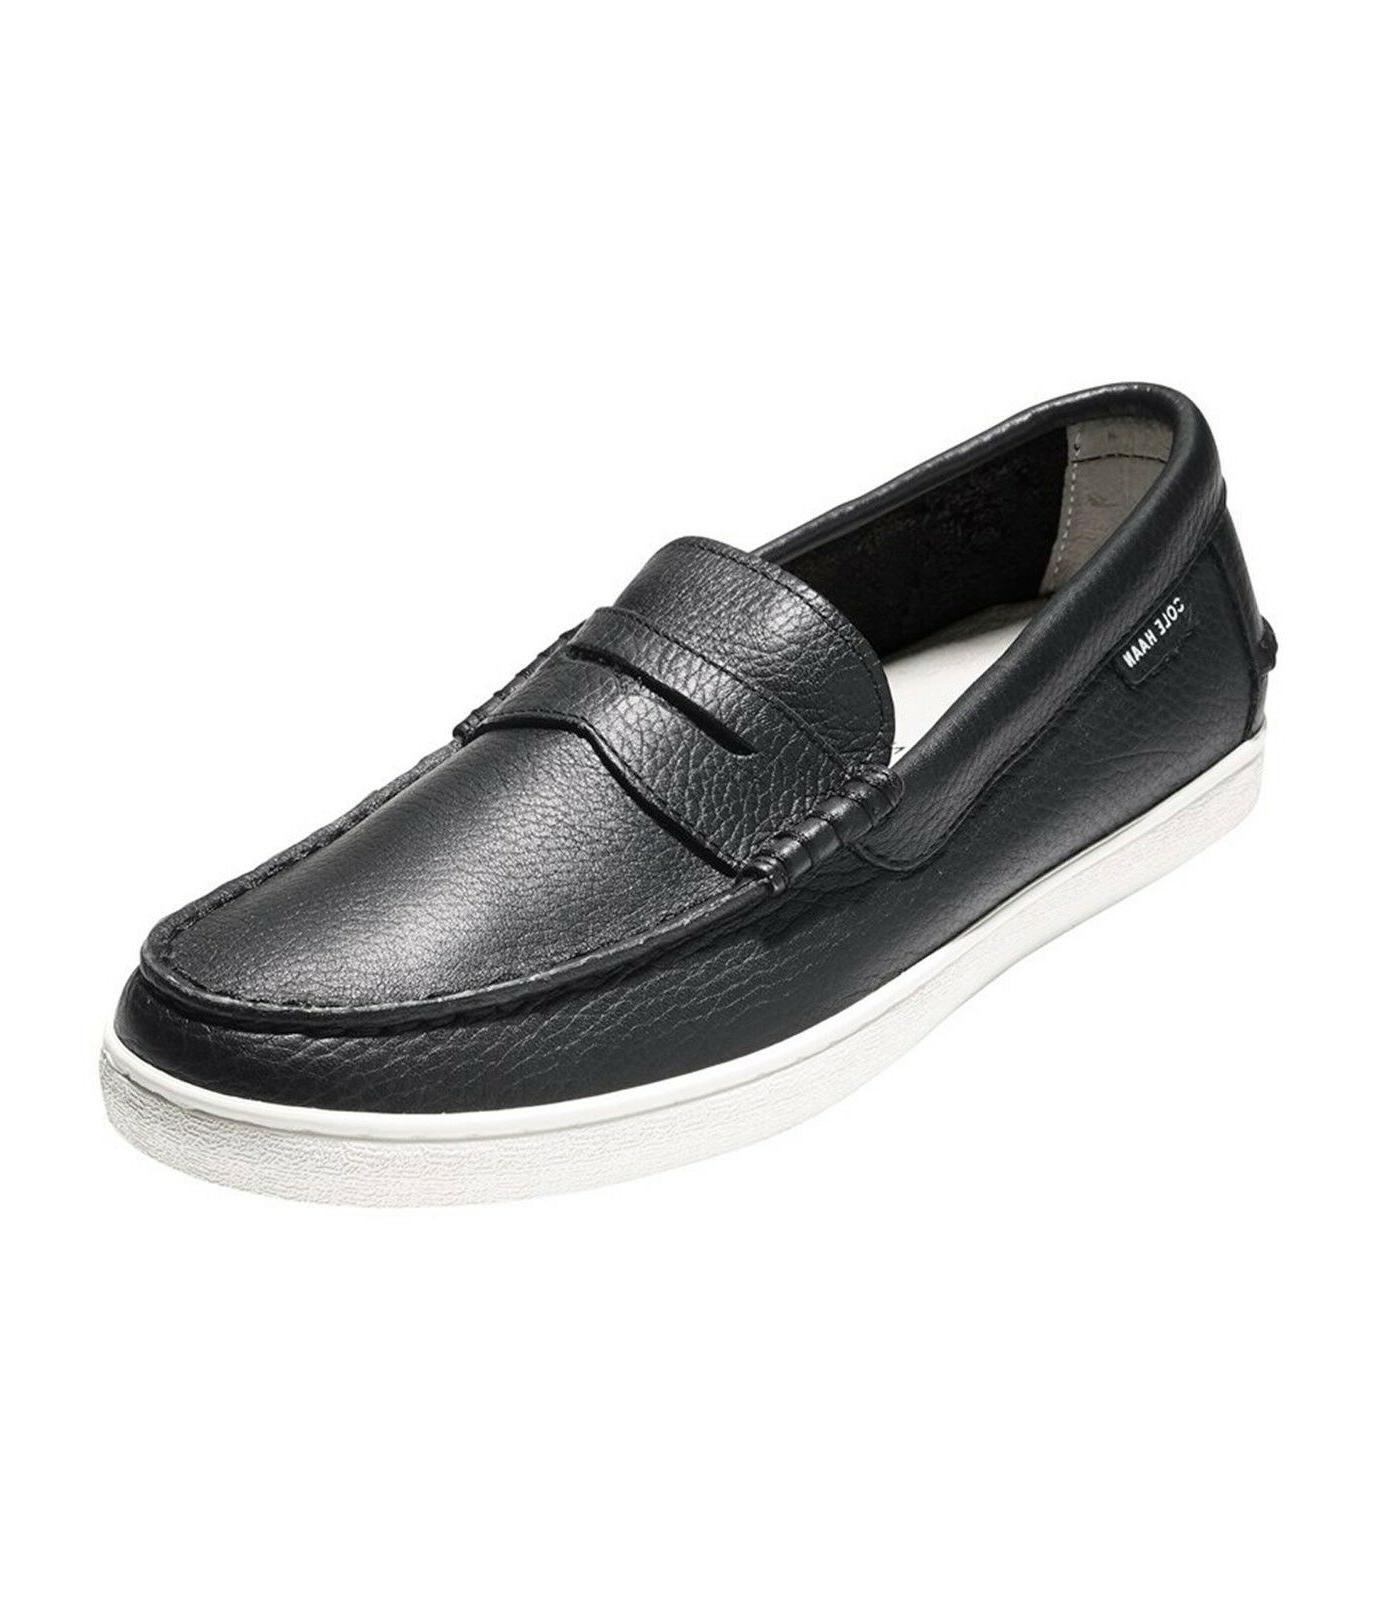 pinch weekender men s size 11m black